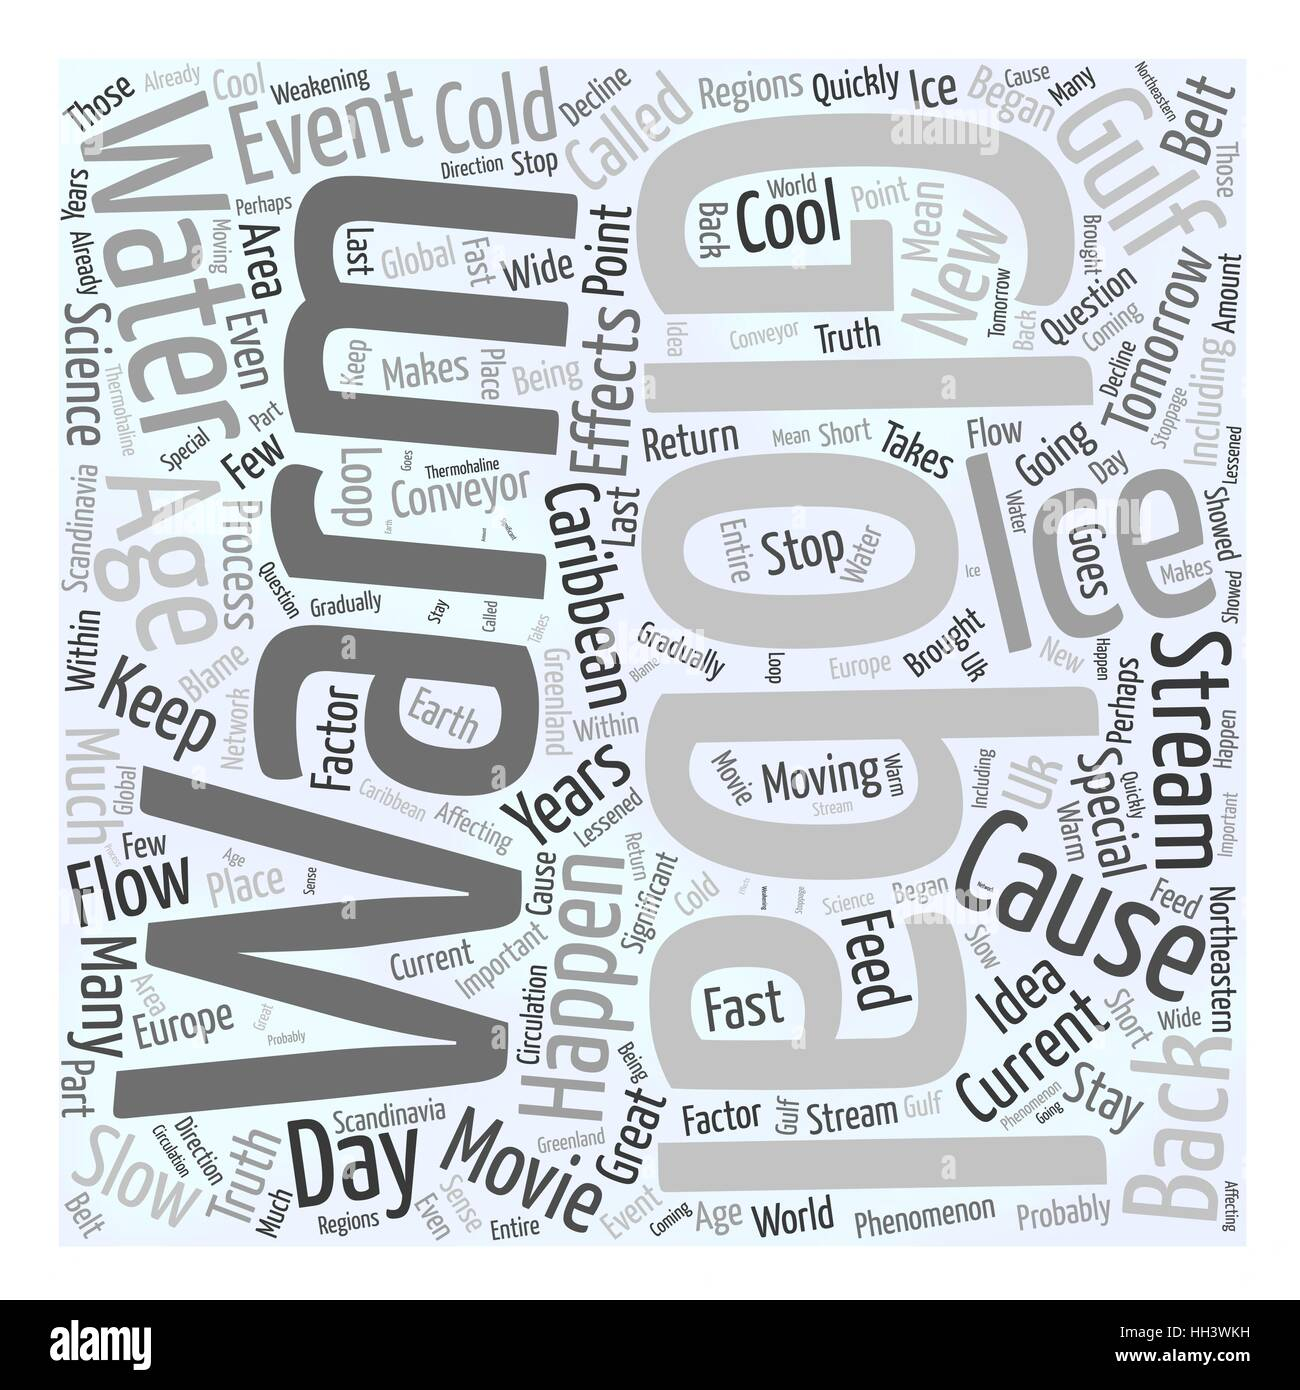 Ice Age Movie Stock Photos & Ice Age Movie Stock Images - Alamy